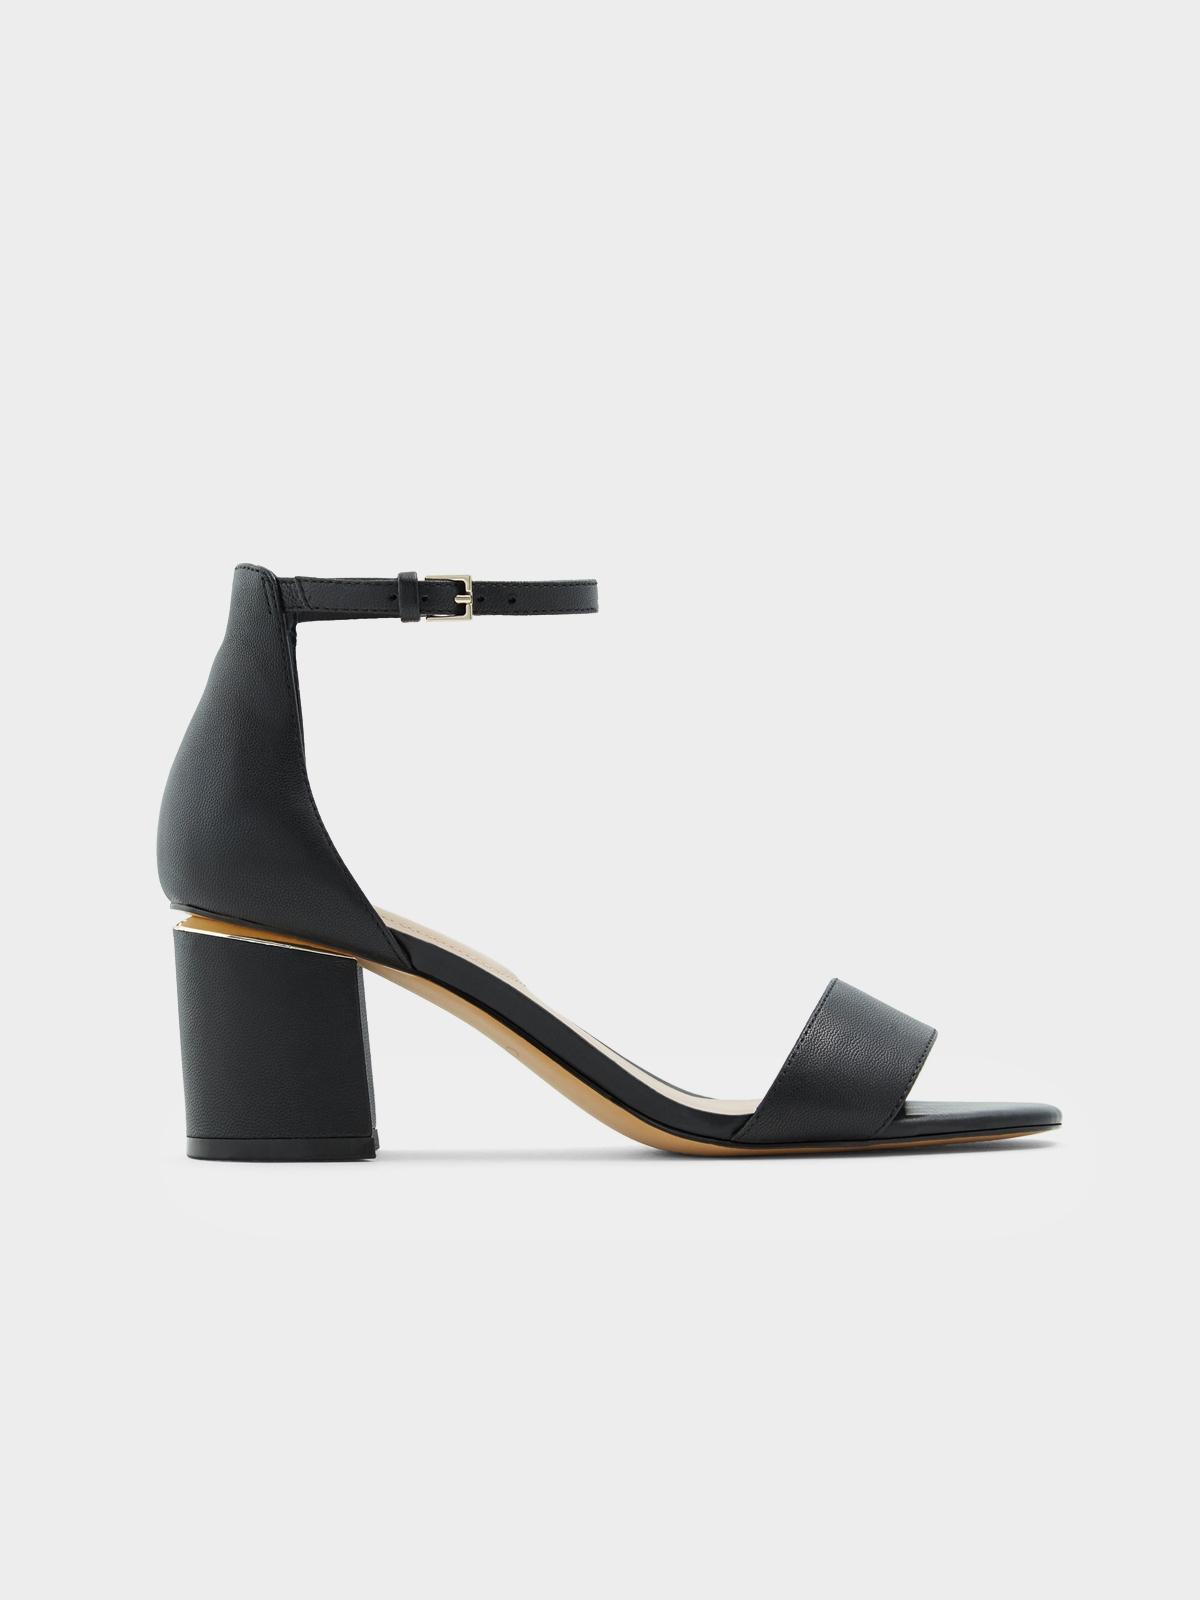 Aldo Valentina Block Heels Black